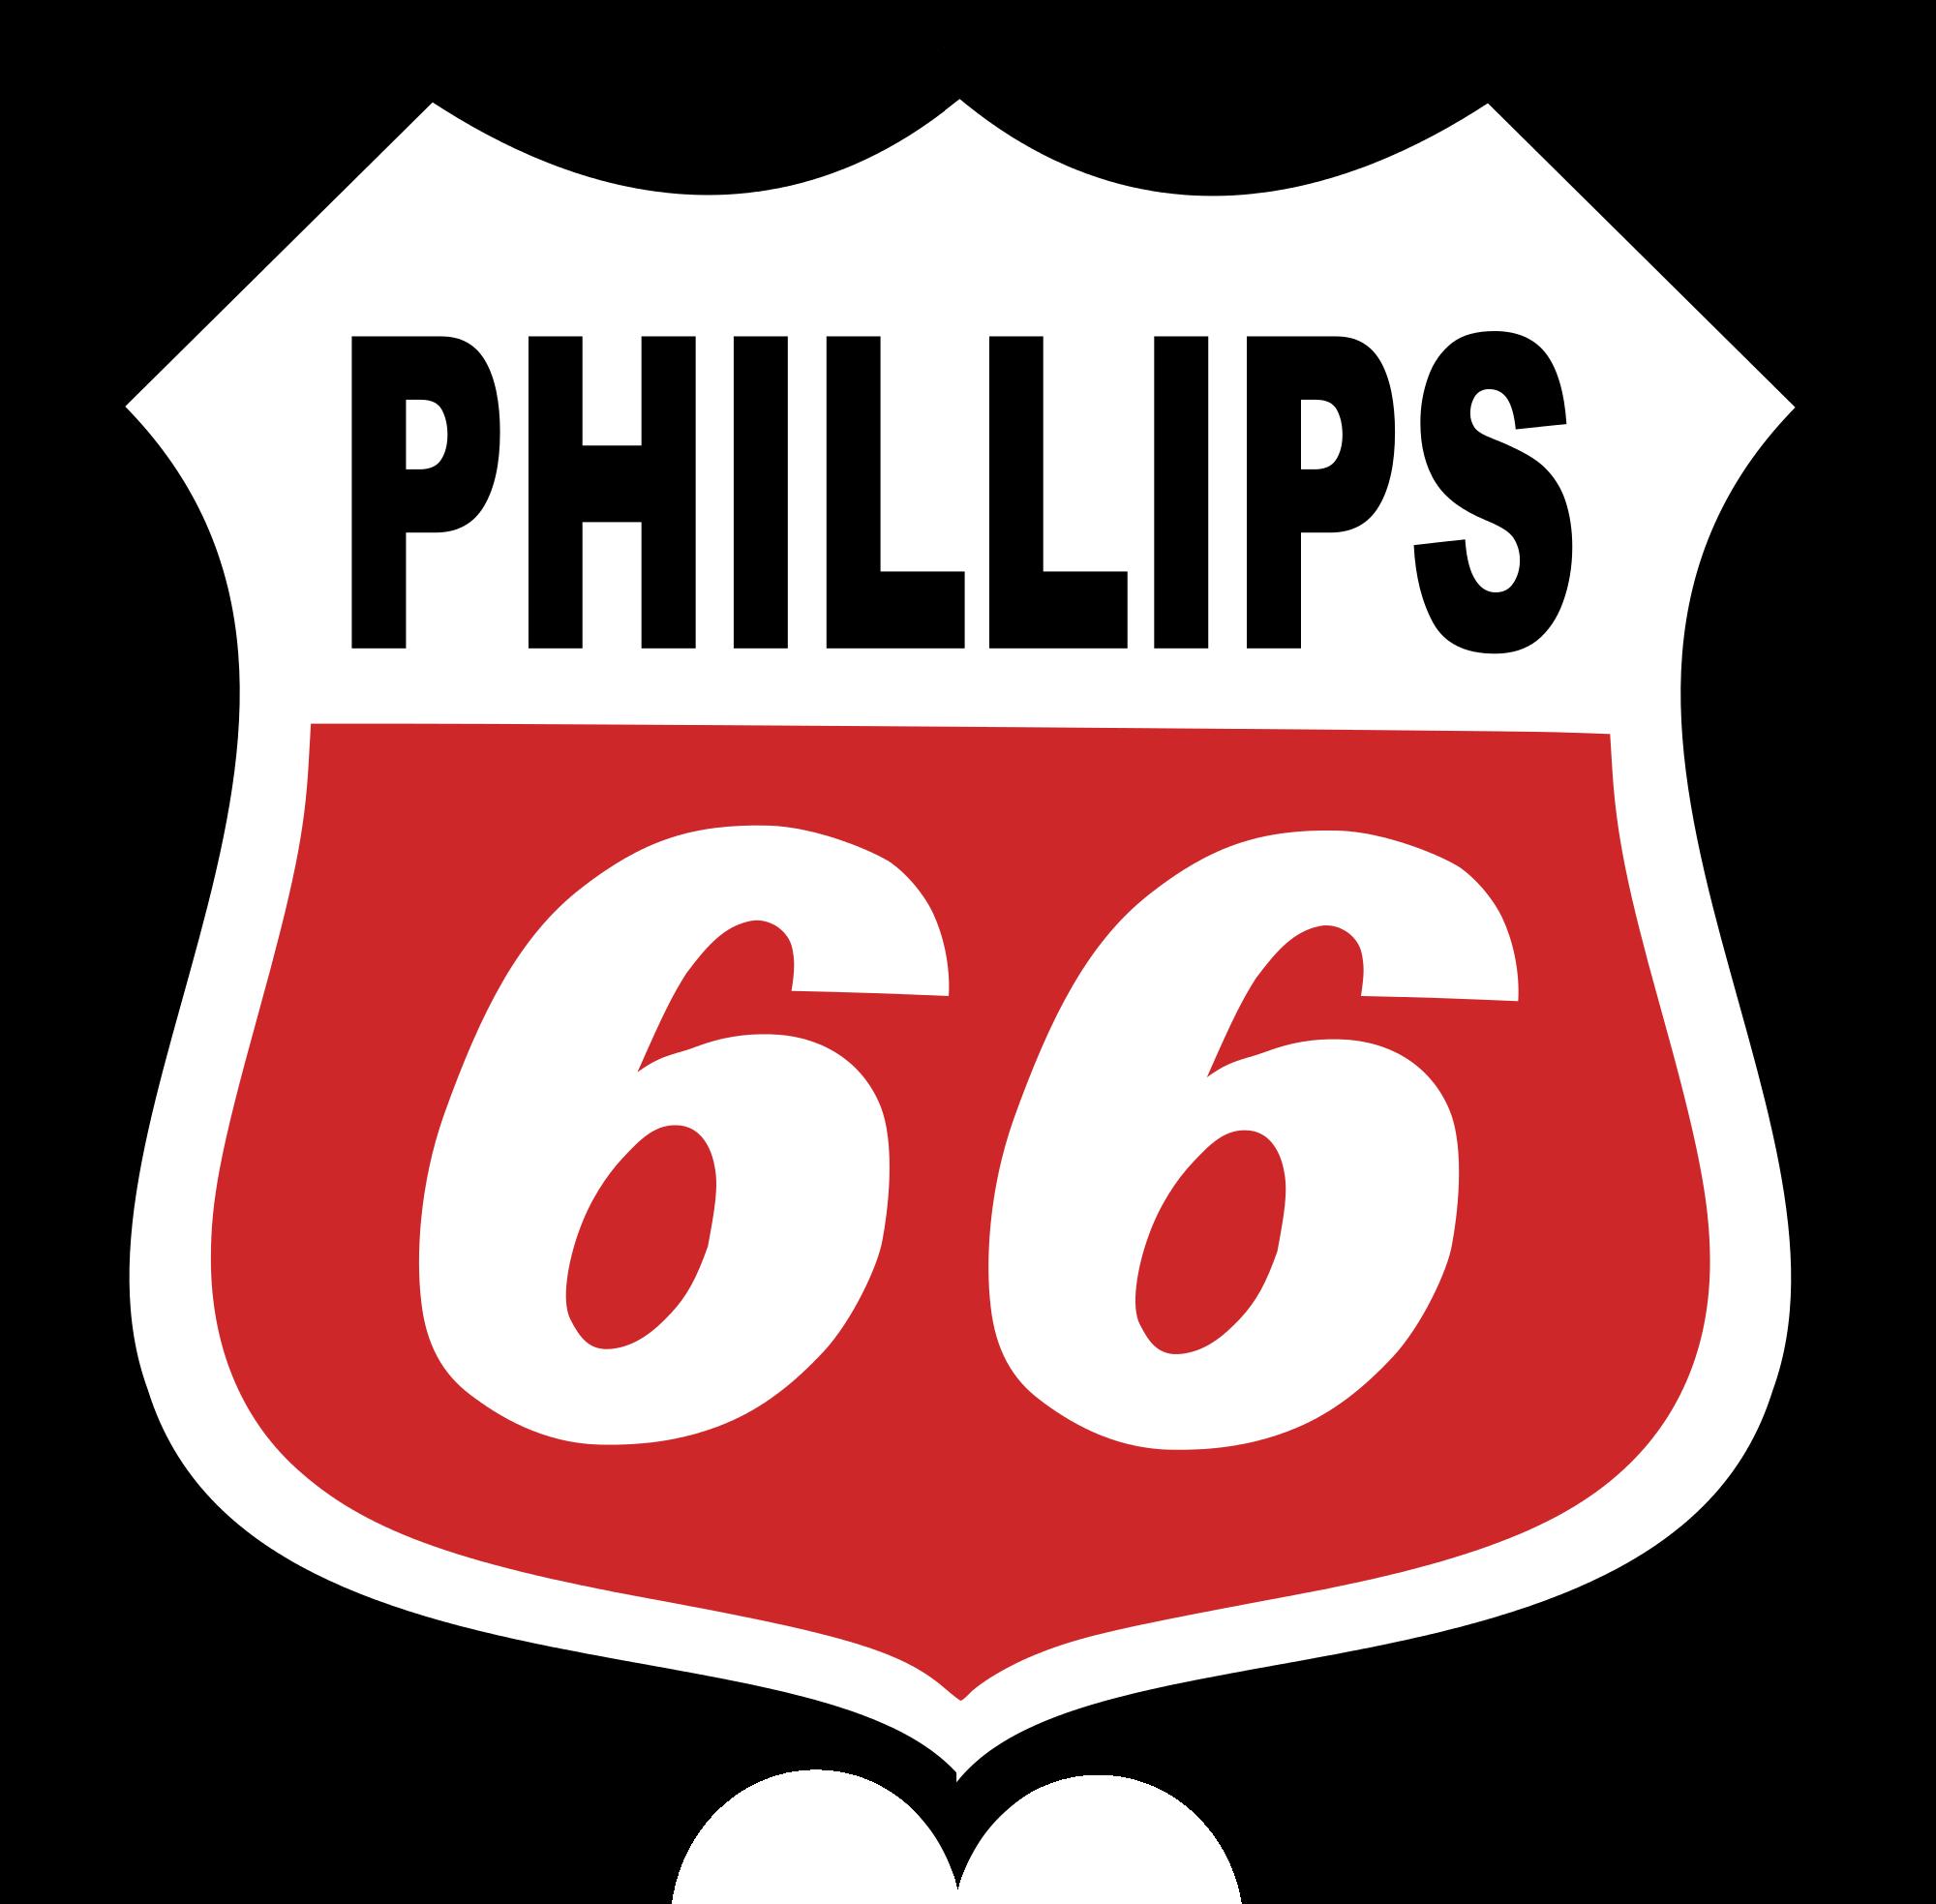 Phillips 66 Magnus Oil 100 Cross Reference